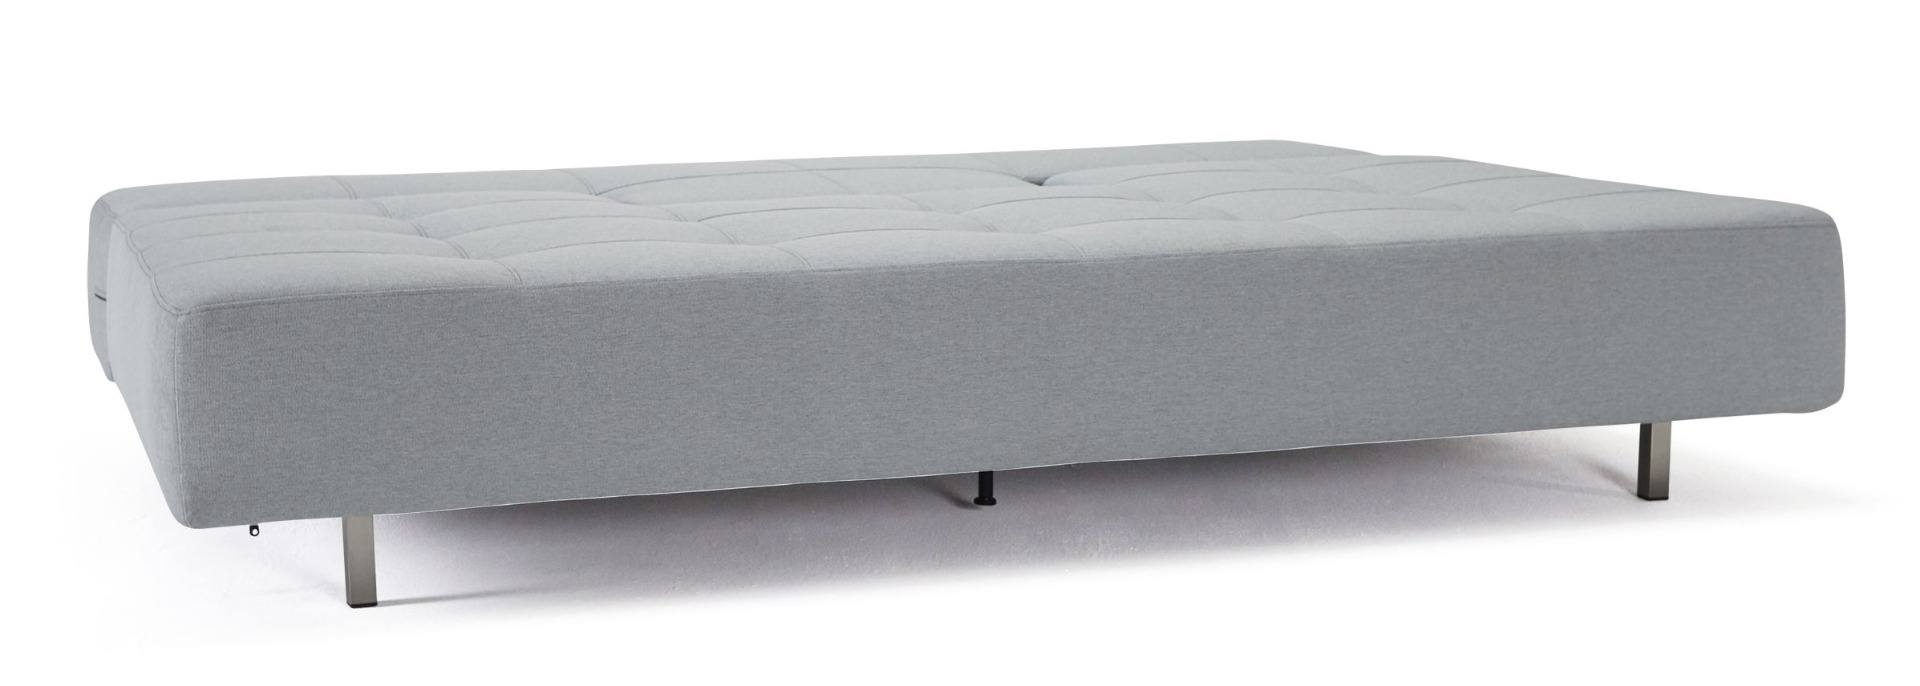 Innovation Slaapbank Long Horn Excess - Stof Twist Granite 565 Grijs